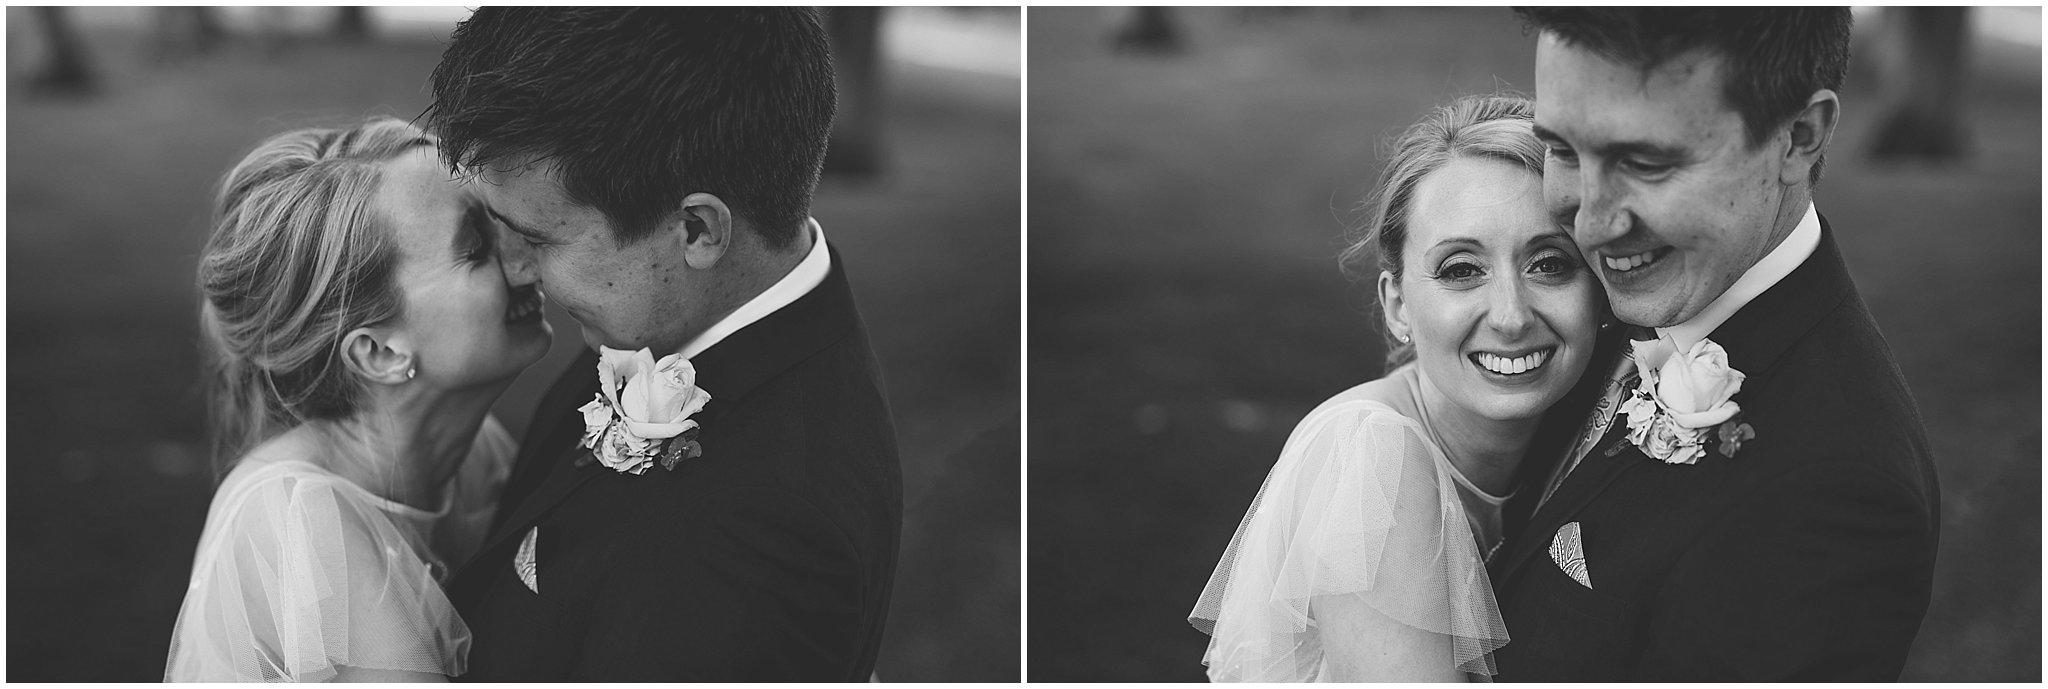 dorset wedding photographer_0132